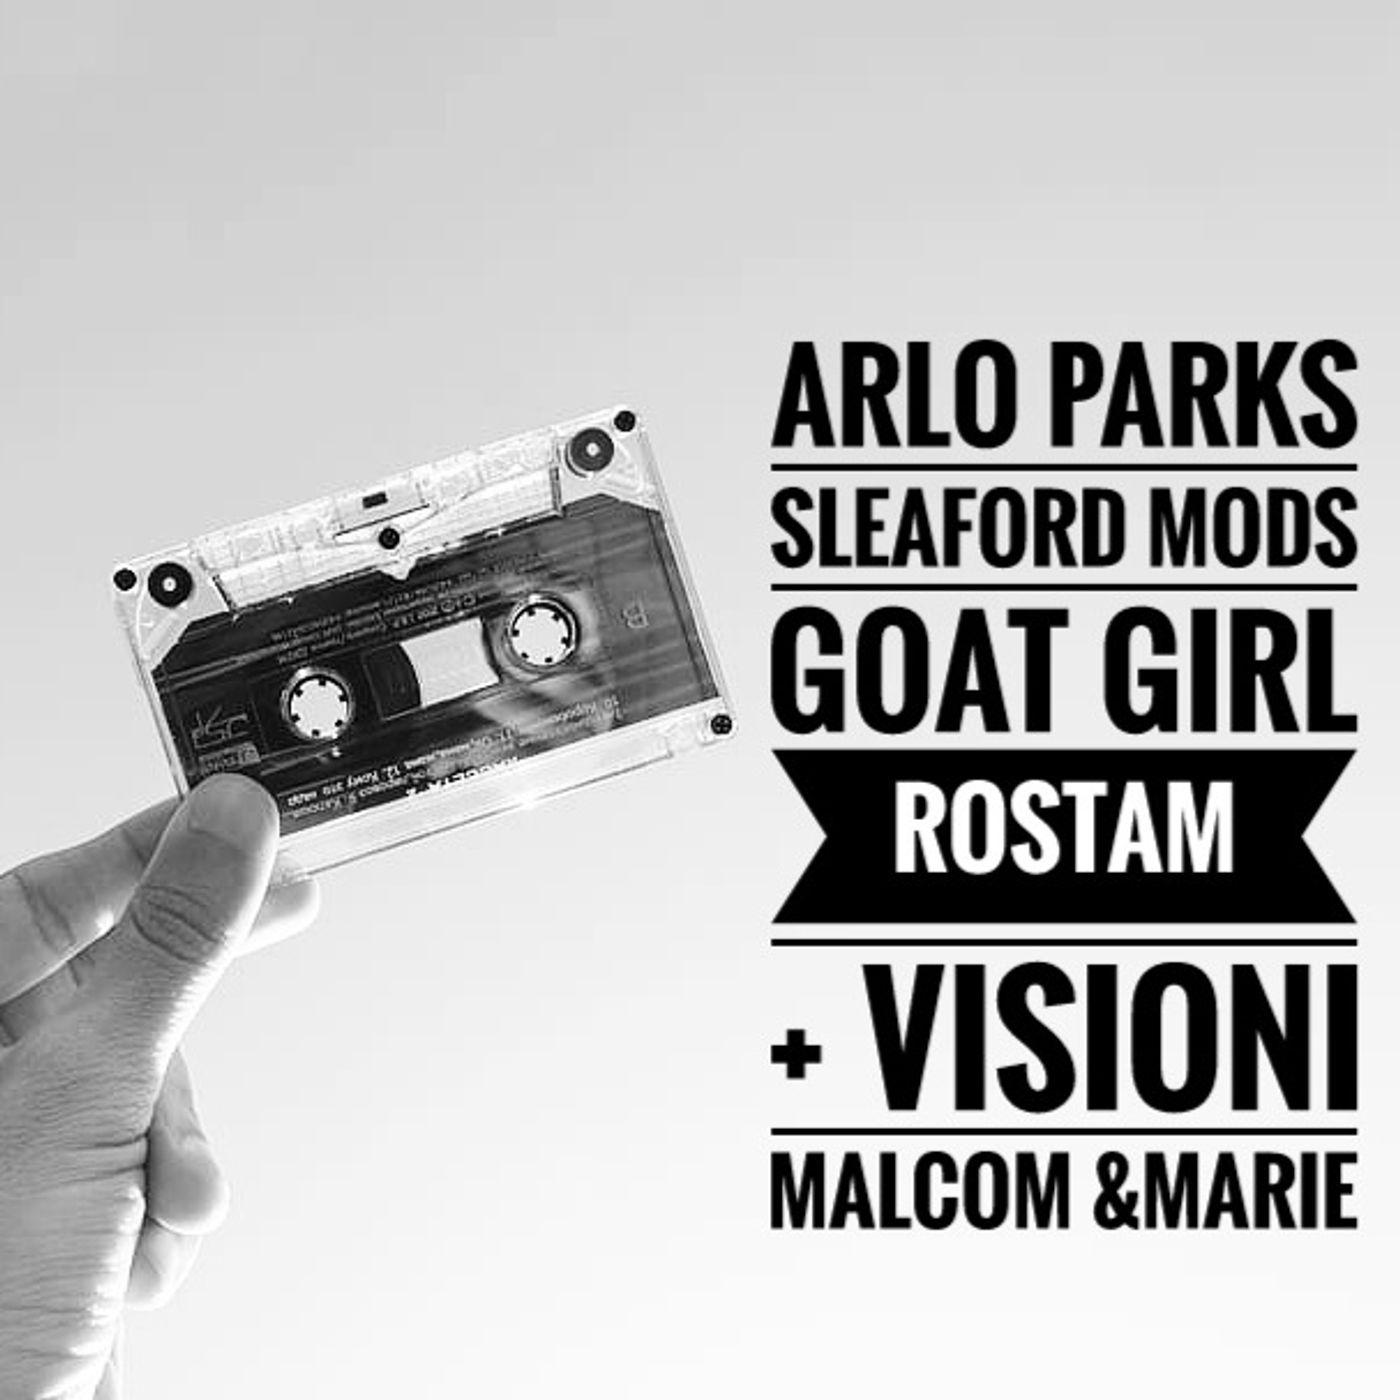 Arlo Parks, Sleaford Mods, Rostam + [Visioni] Malcom&Marie - Propaganda S4e20